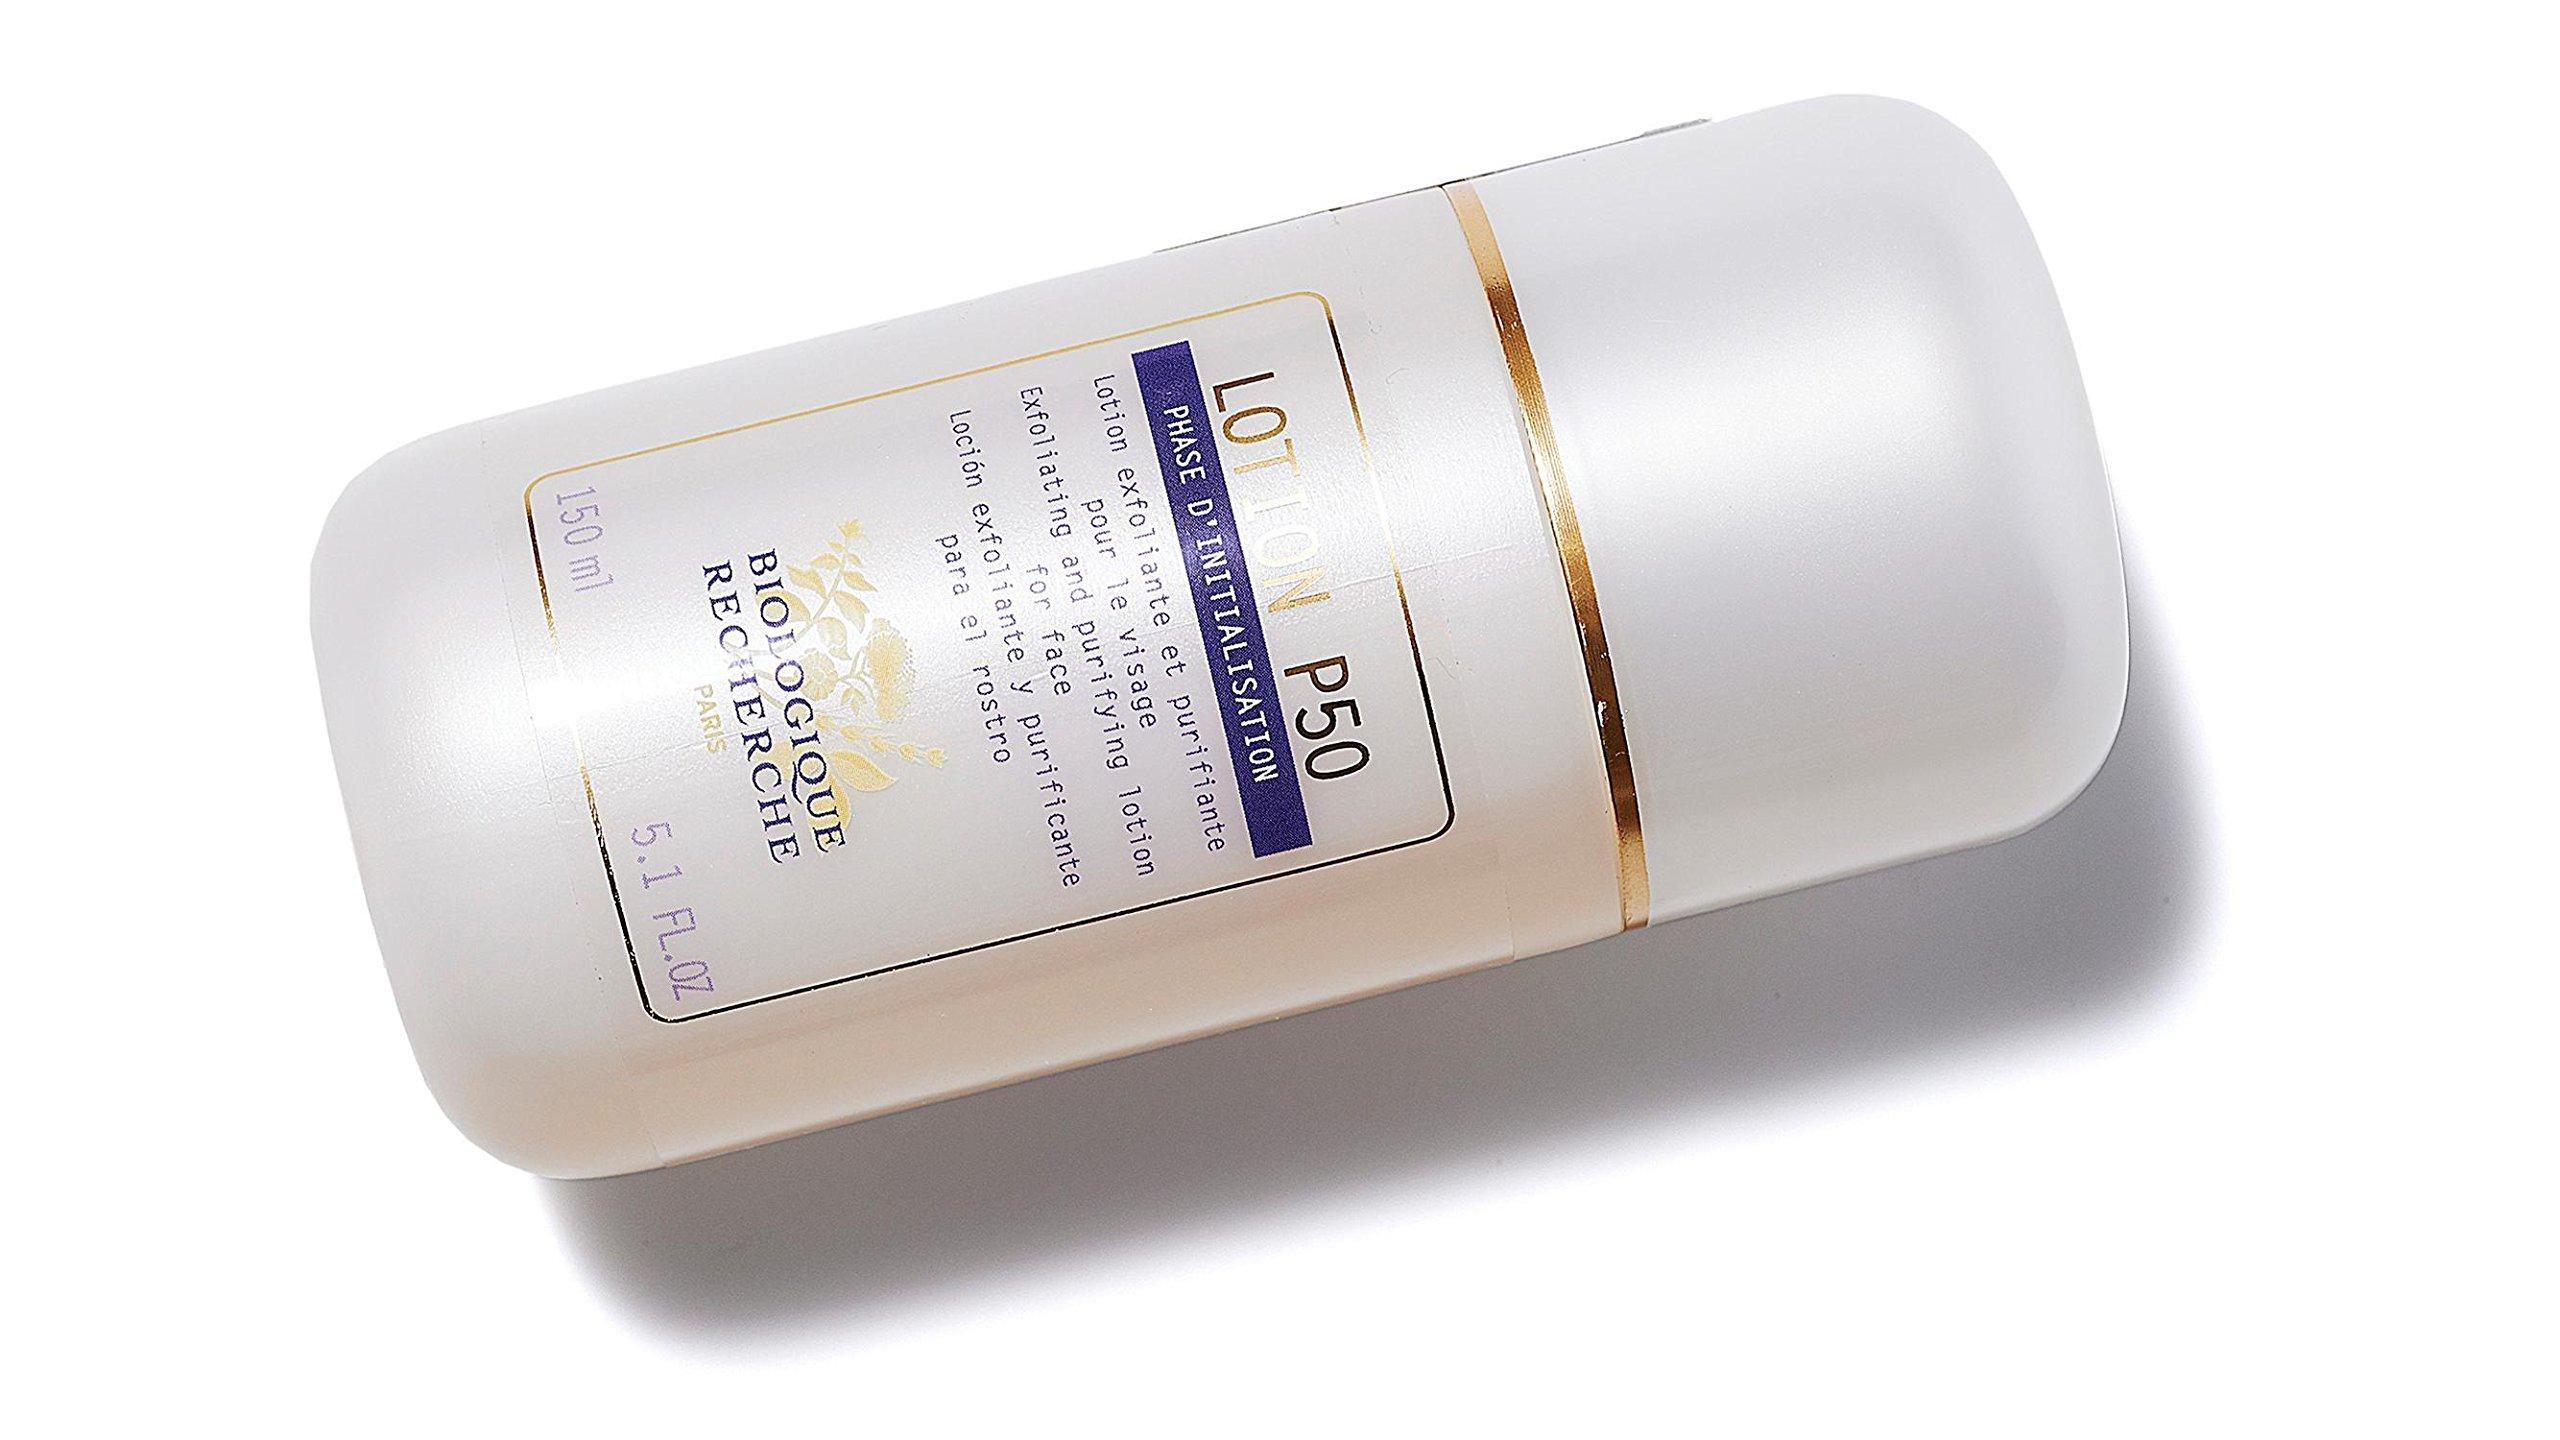 Biologique Recherche Lotion P50 NO Phenol Normal to Oily Skin by Biologique Recherche